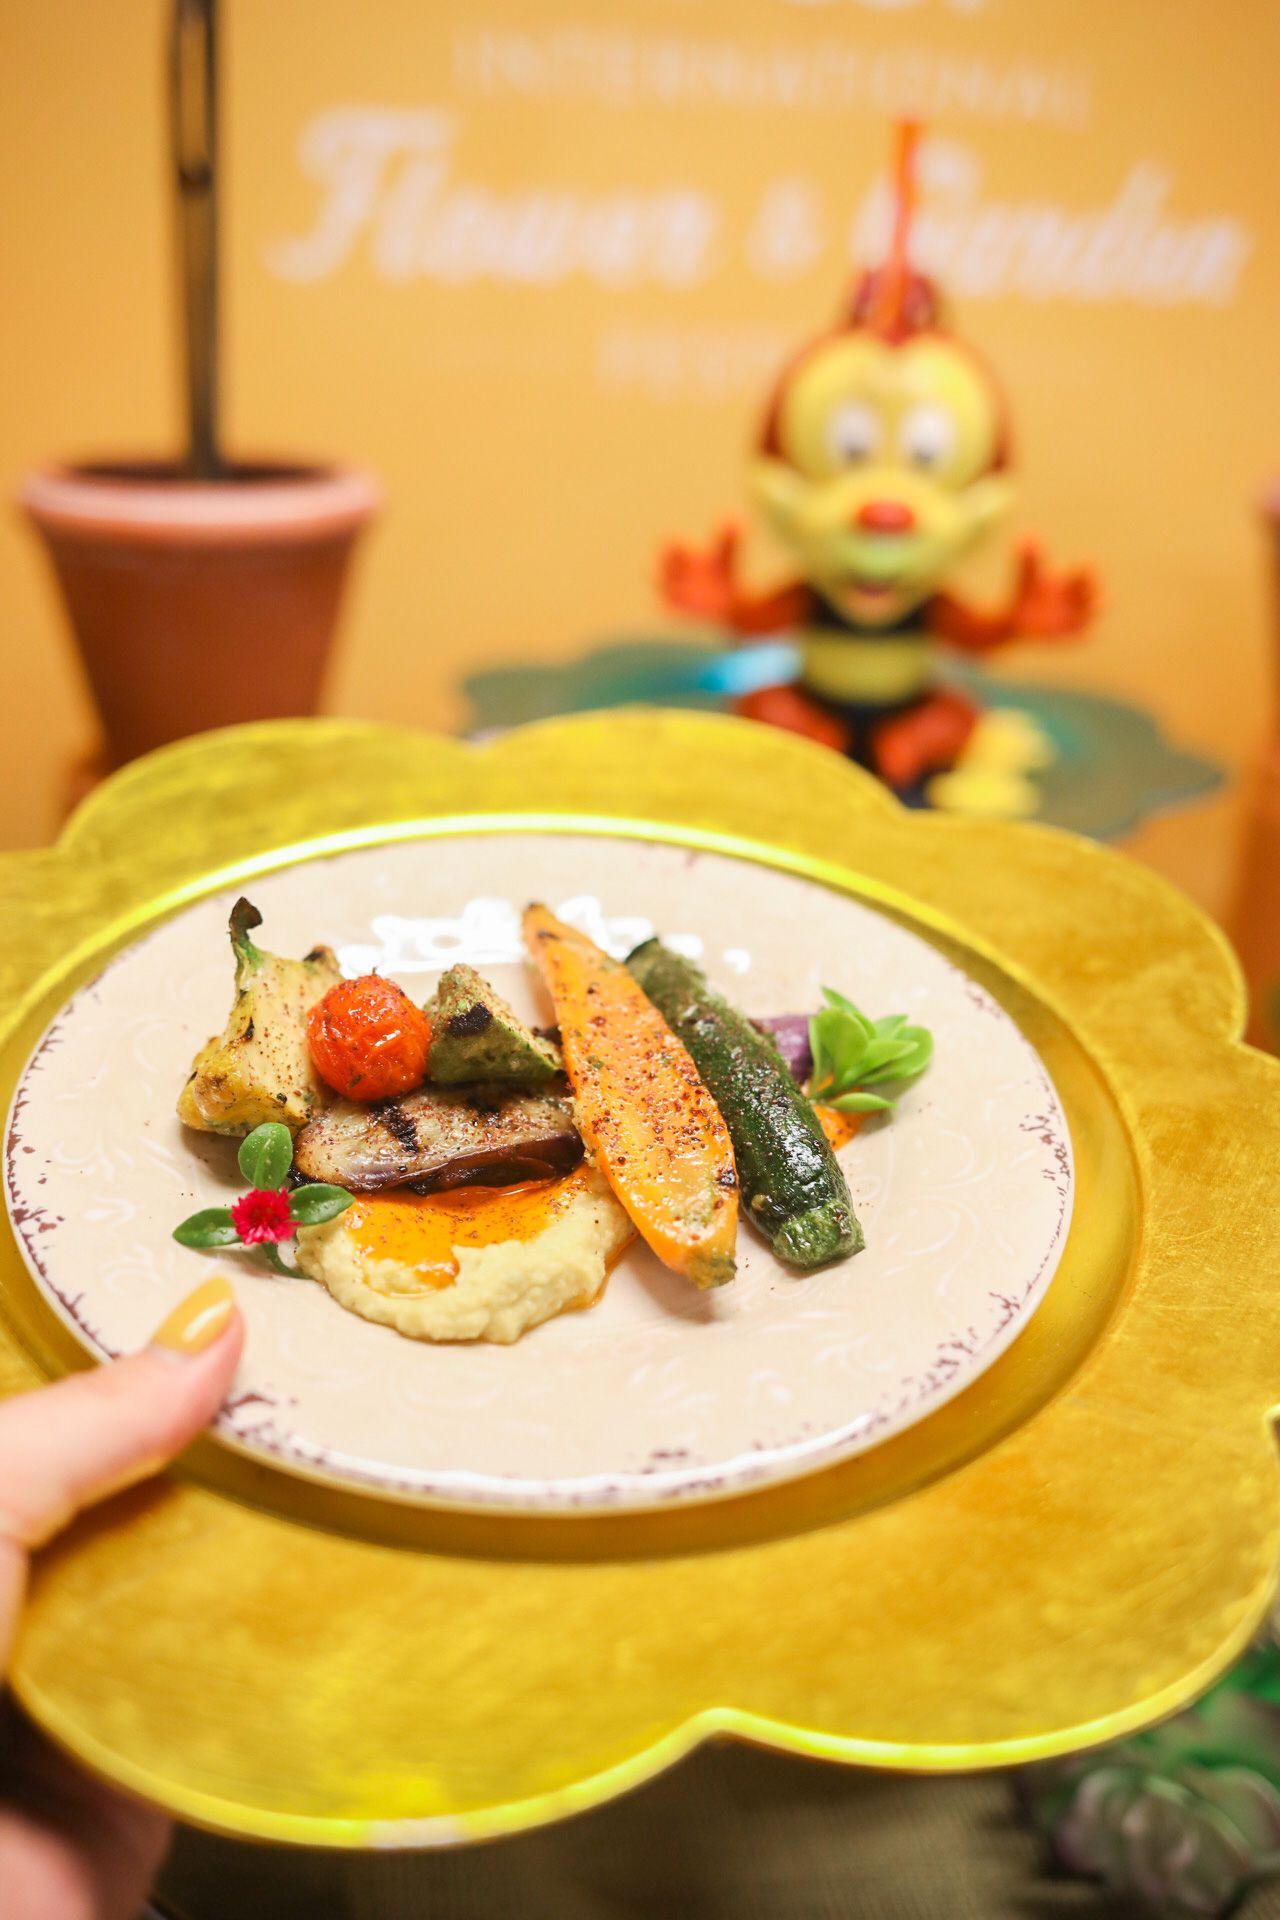 Flower Garden Festival 2020 Food Guide and Gluten Free